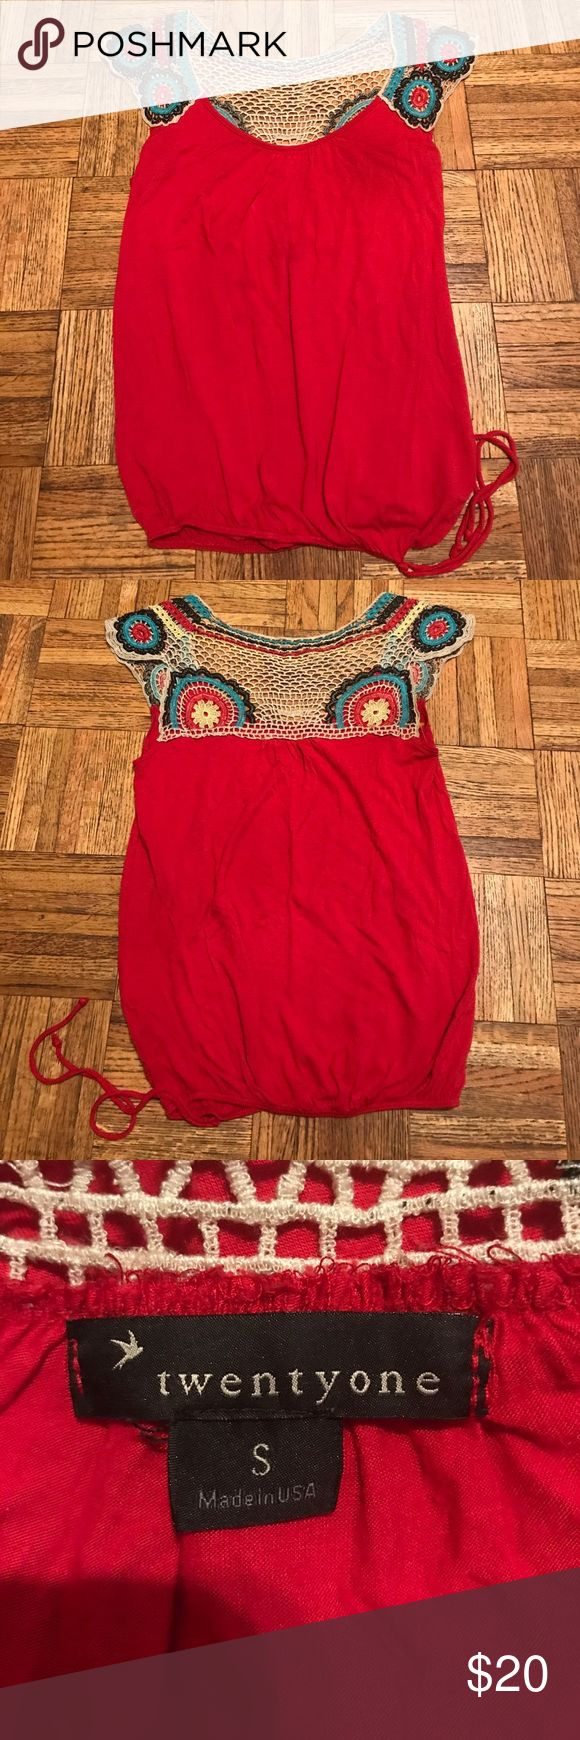 Women's Crochet Shirt Size S Women's crochet shirt with a tie at the side. Size Small TwentyOne Tops